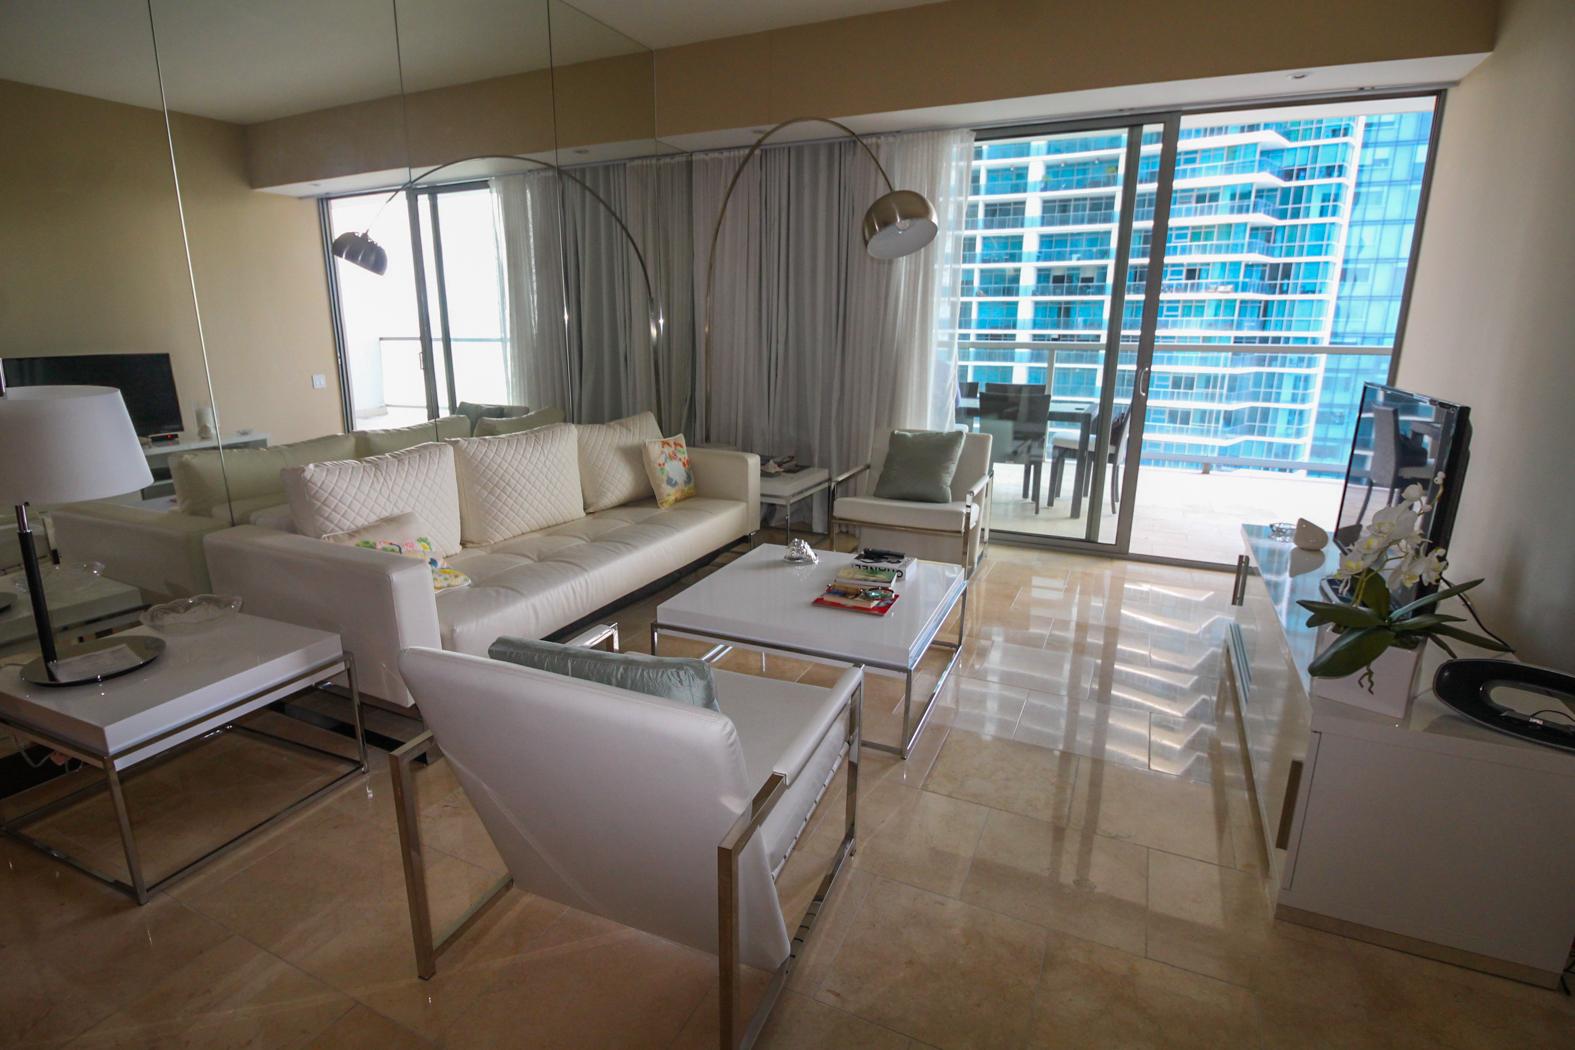 Punta-Pacifica-Panama-property-panamaequityjewel-oceanfront-trump-11.jpg